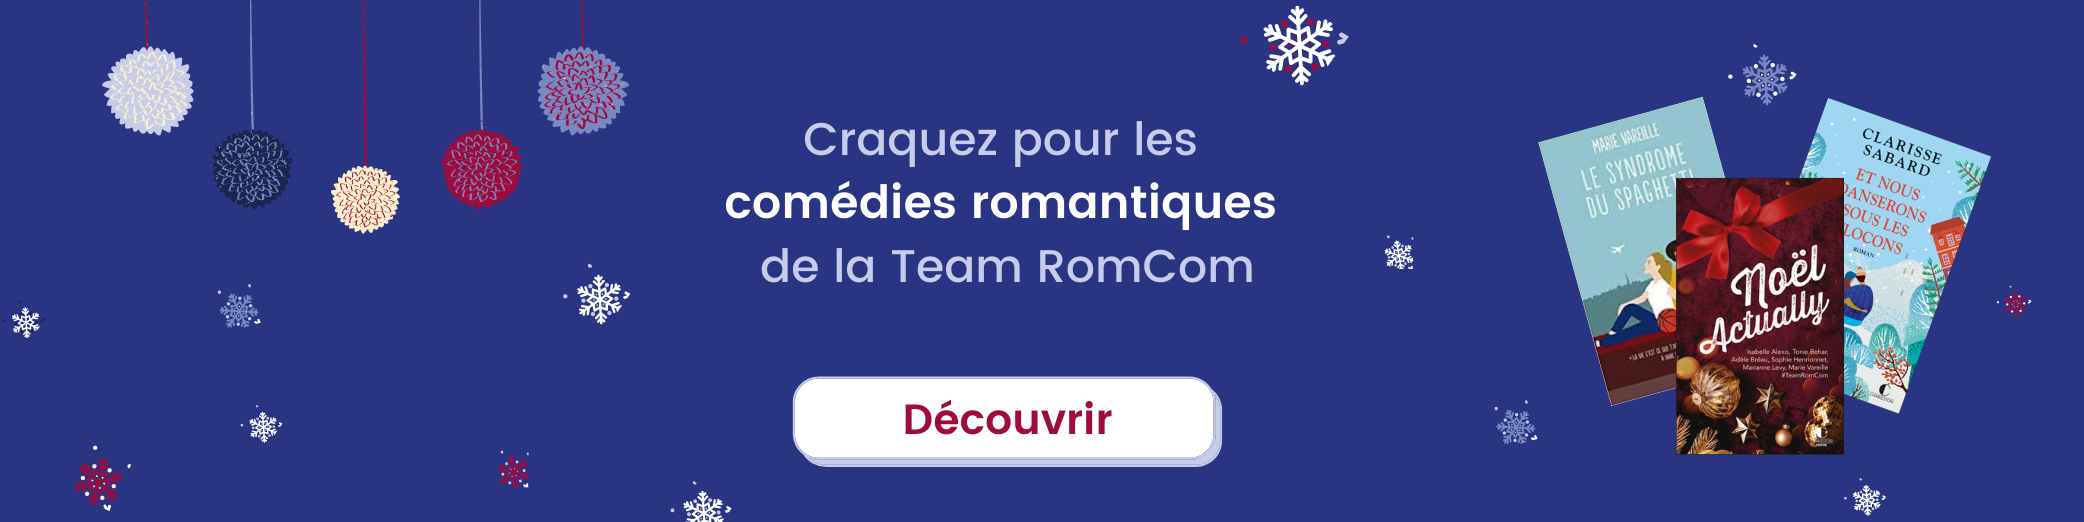 Découvrir la Team RomCom